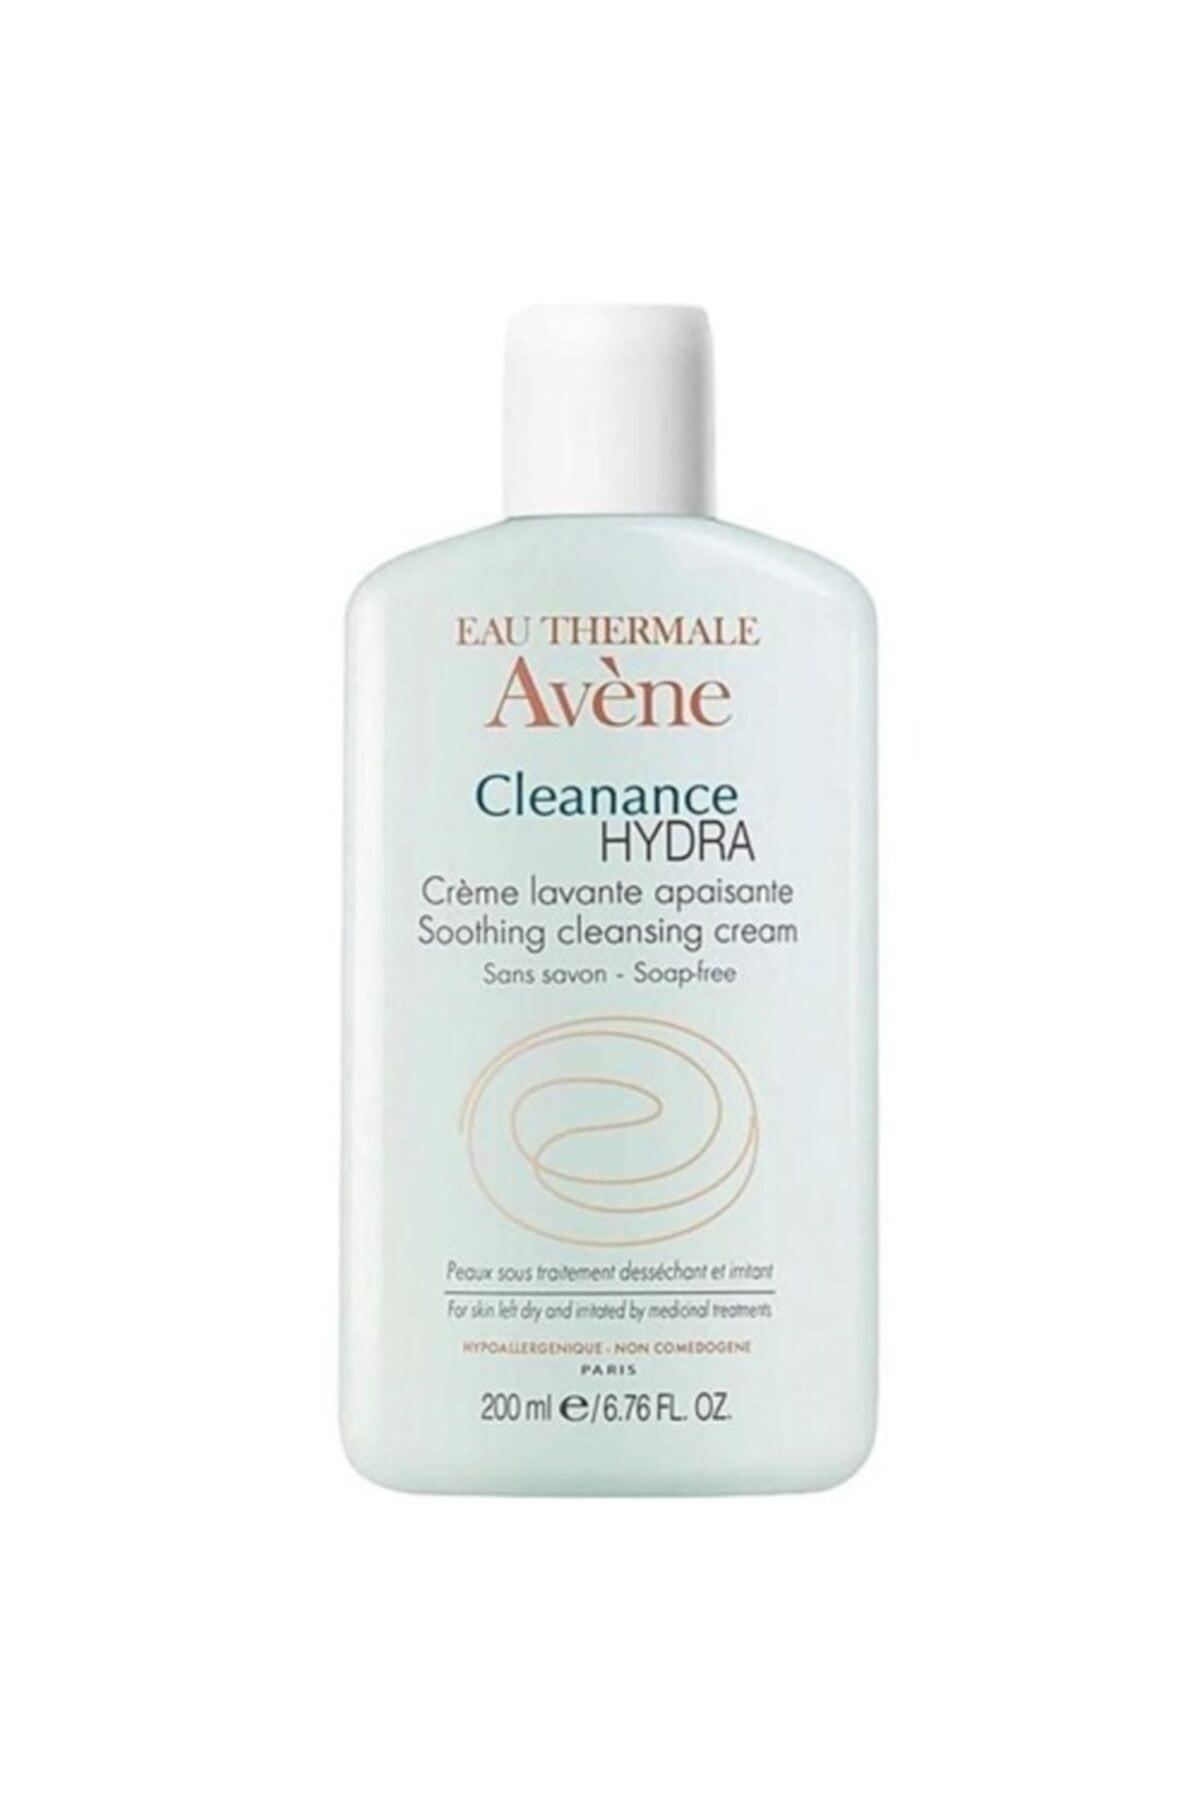 Avene Cleanance Hydra 200 ml 1